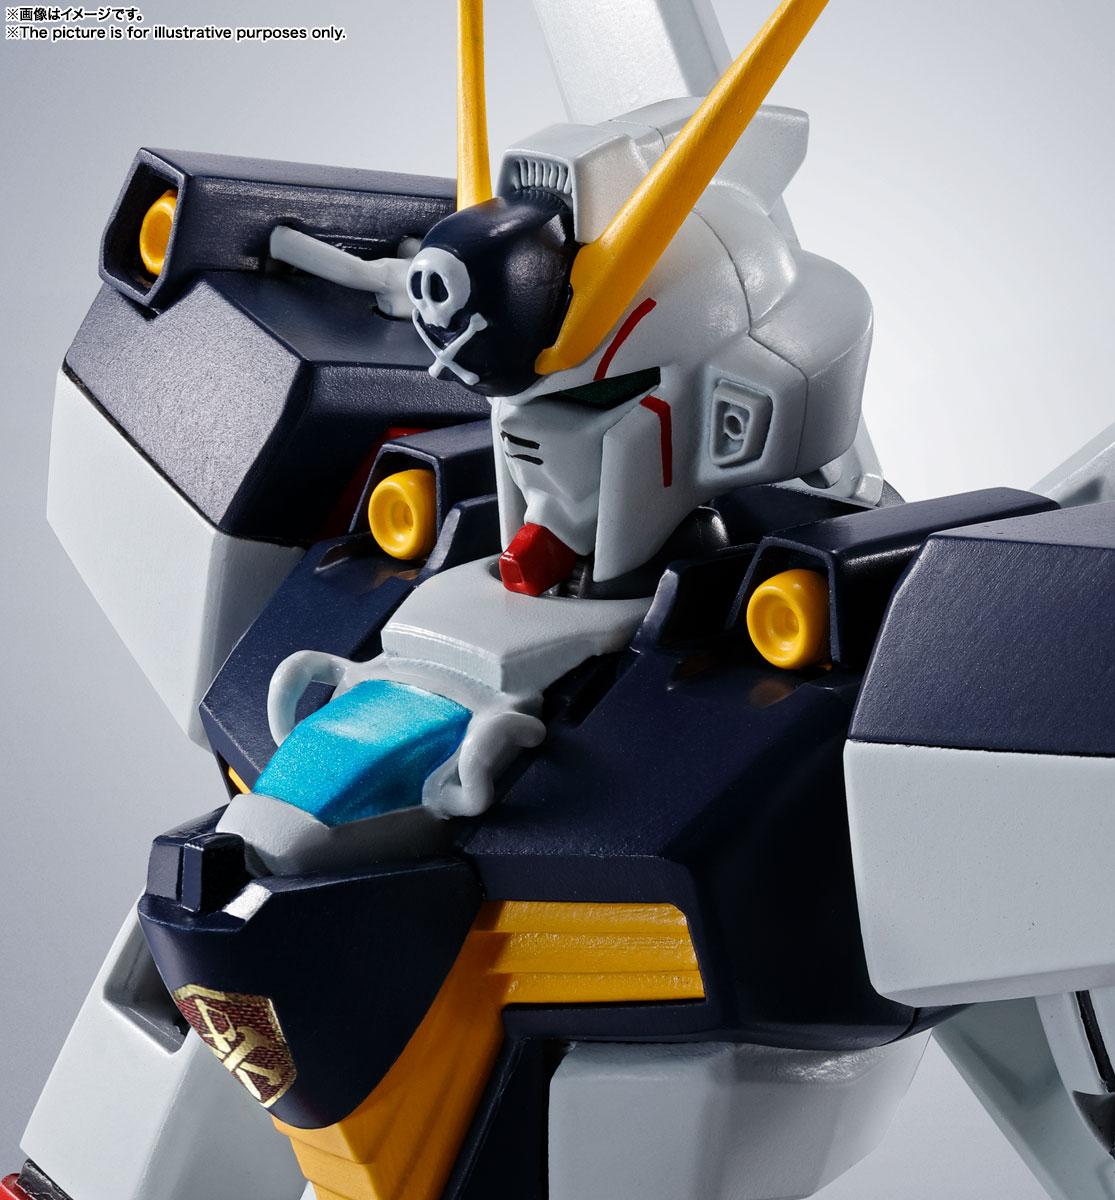 ROBOT魂〈SIDE MS〉『ガンダムX1/X1改 EVOLUTION-SPEC』クロスボーン・ガンダム 可動フィギュア-009